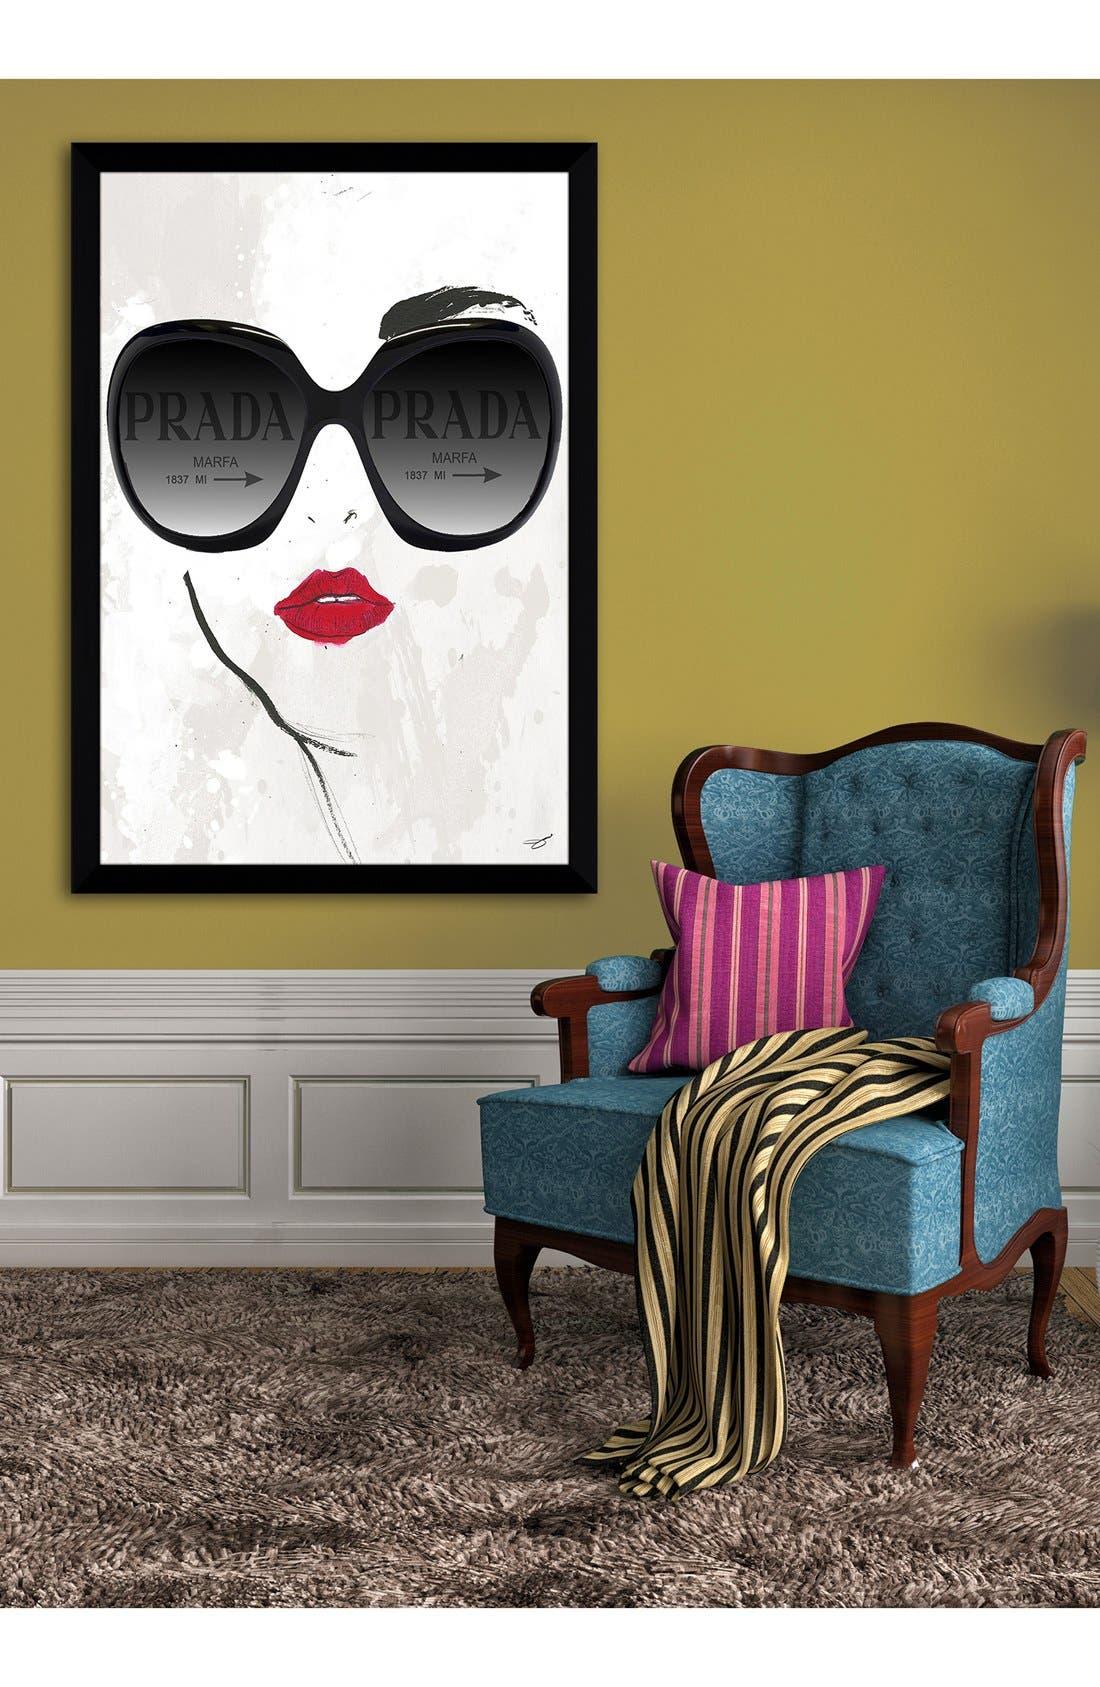 Alternate Image 2  - Picture Perfect 'Prada Sunnies' Fine Art Print